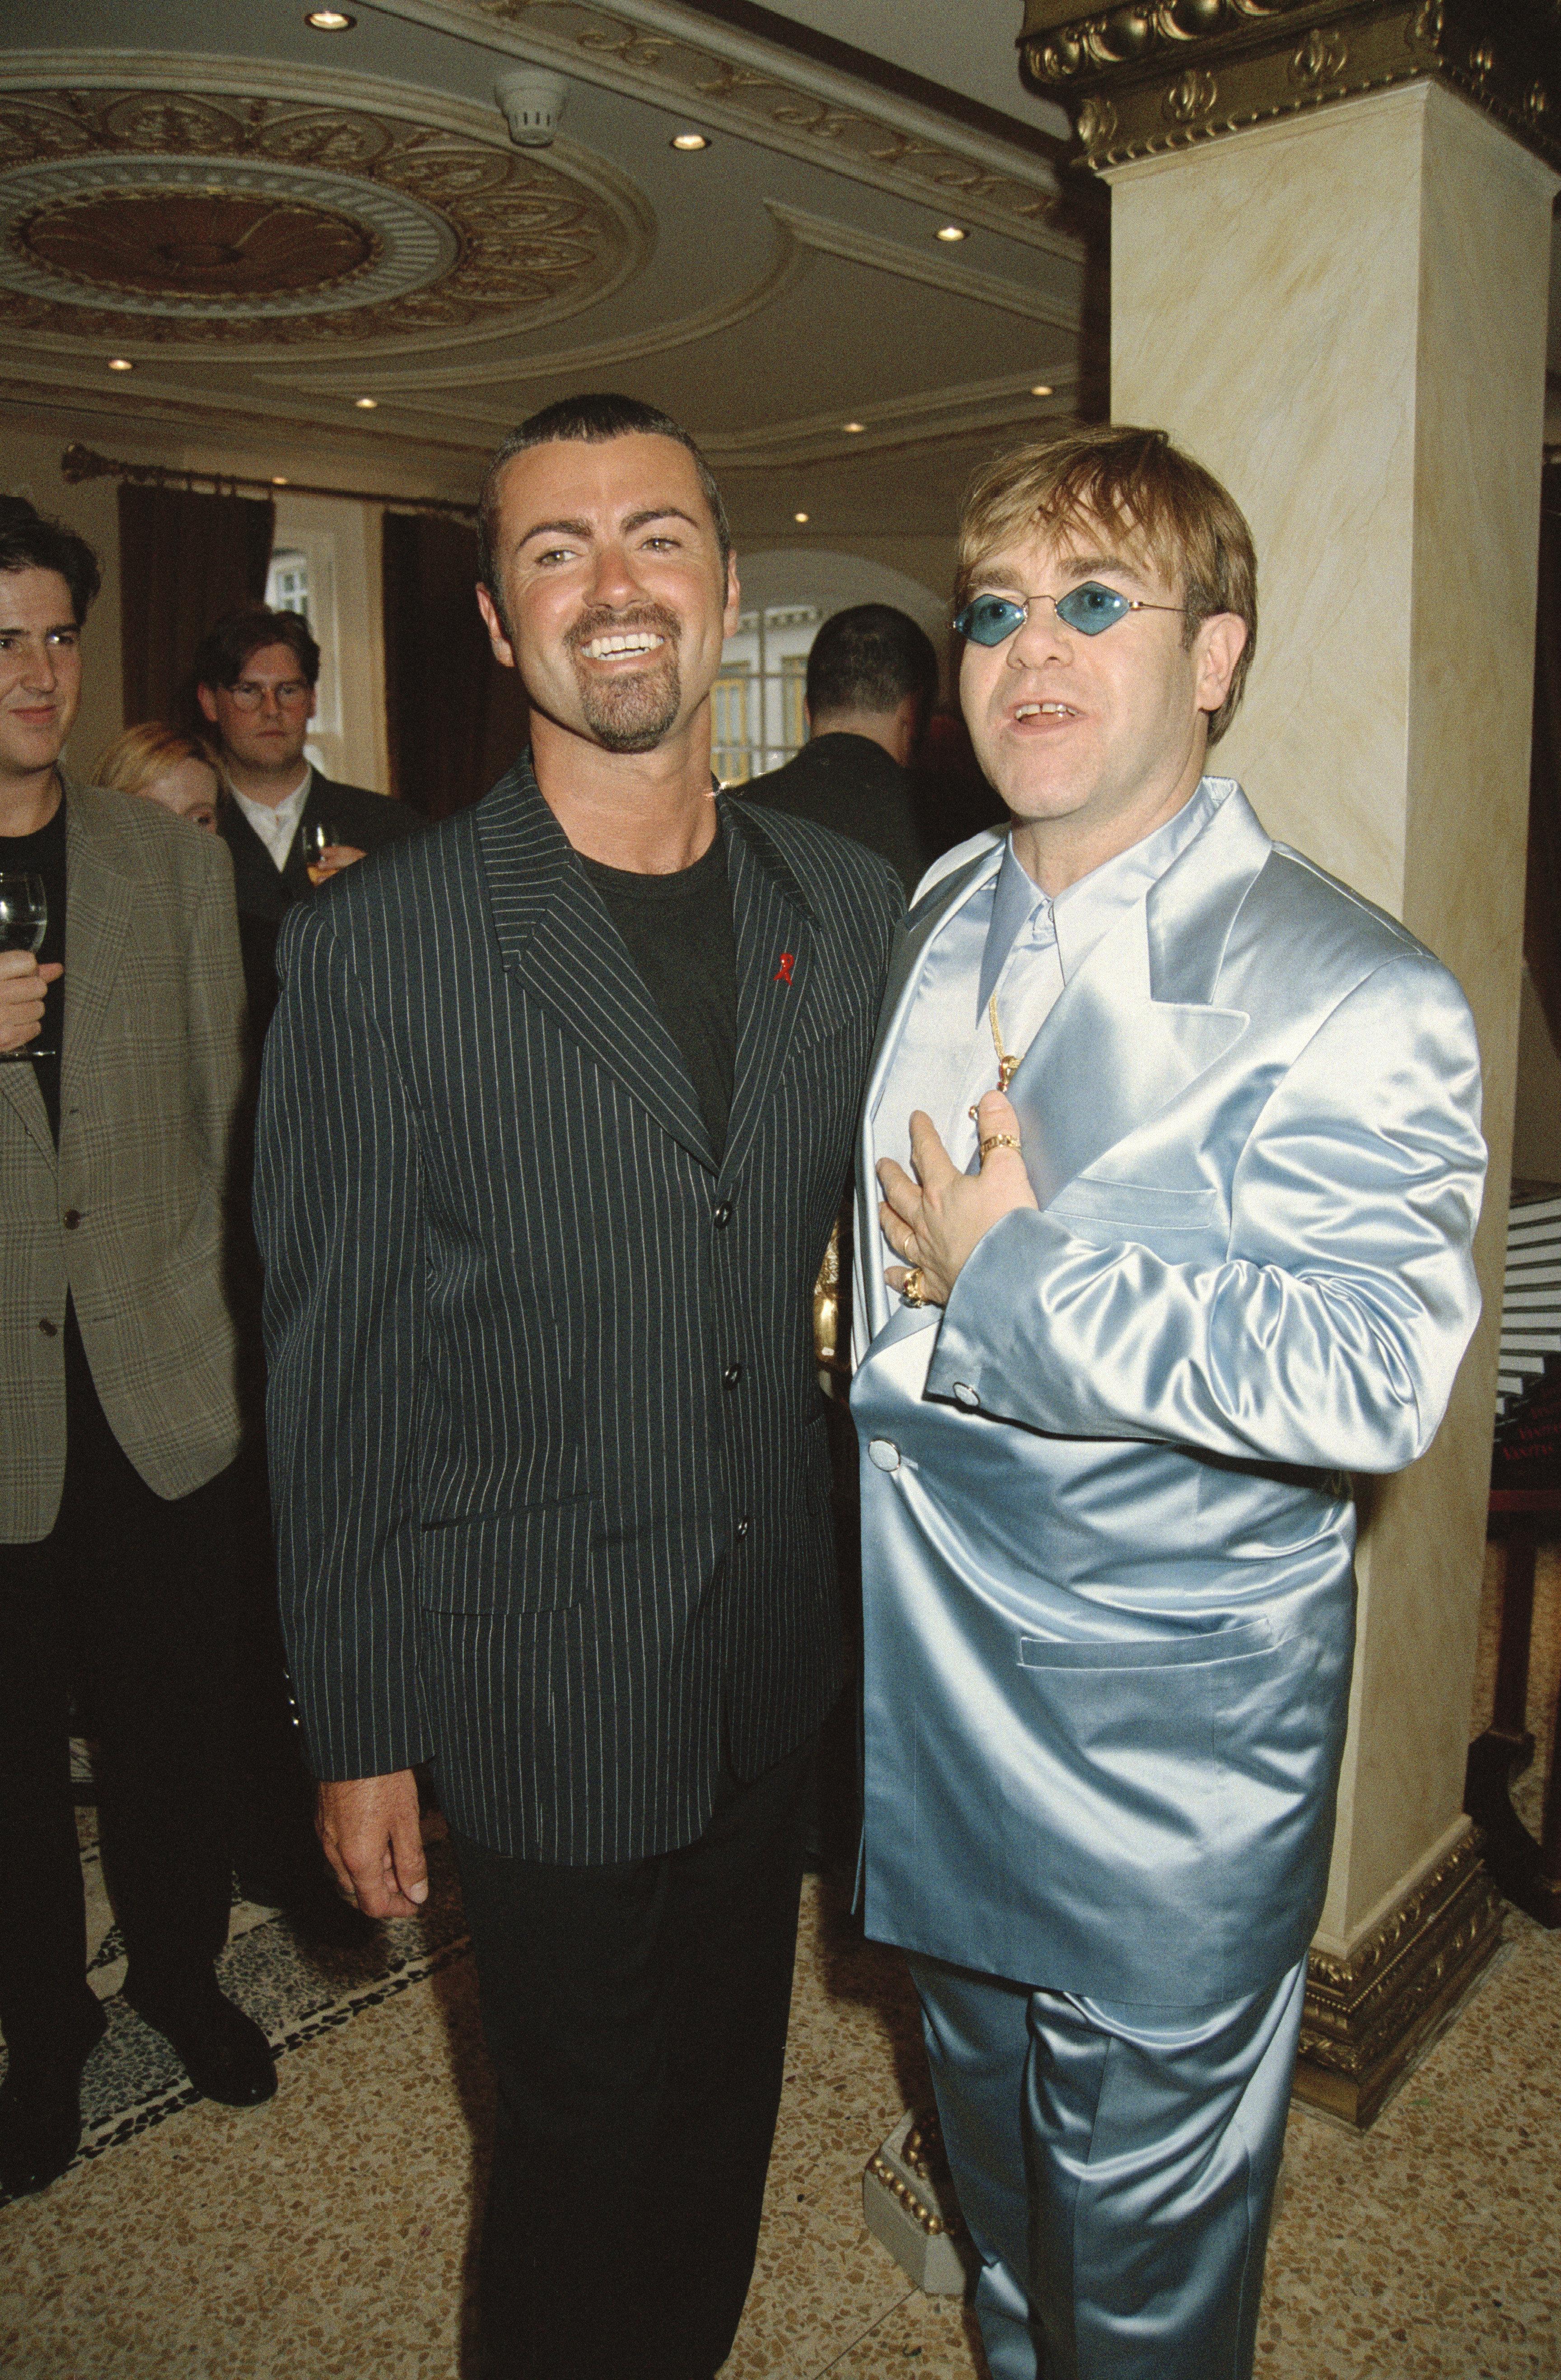 Elton John Breaks Down As He Makes Emotional Musical Tribute To Pal George